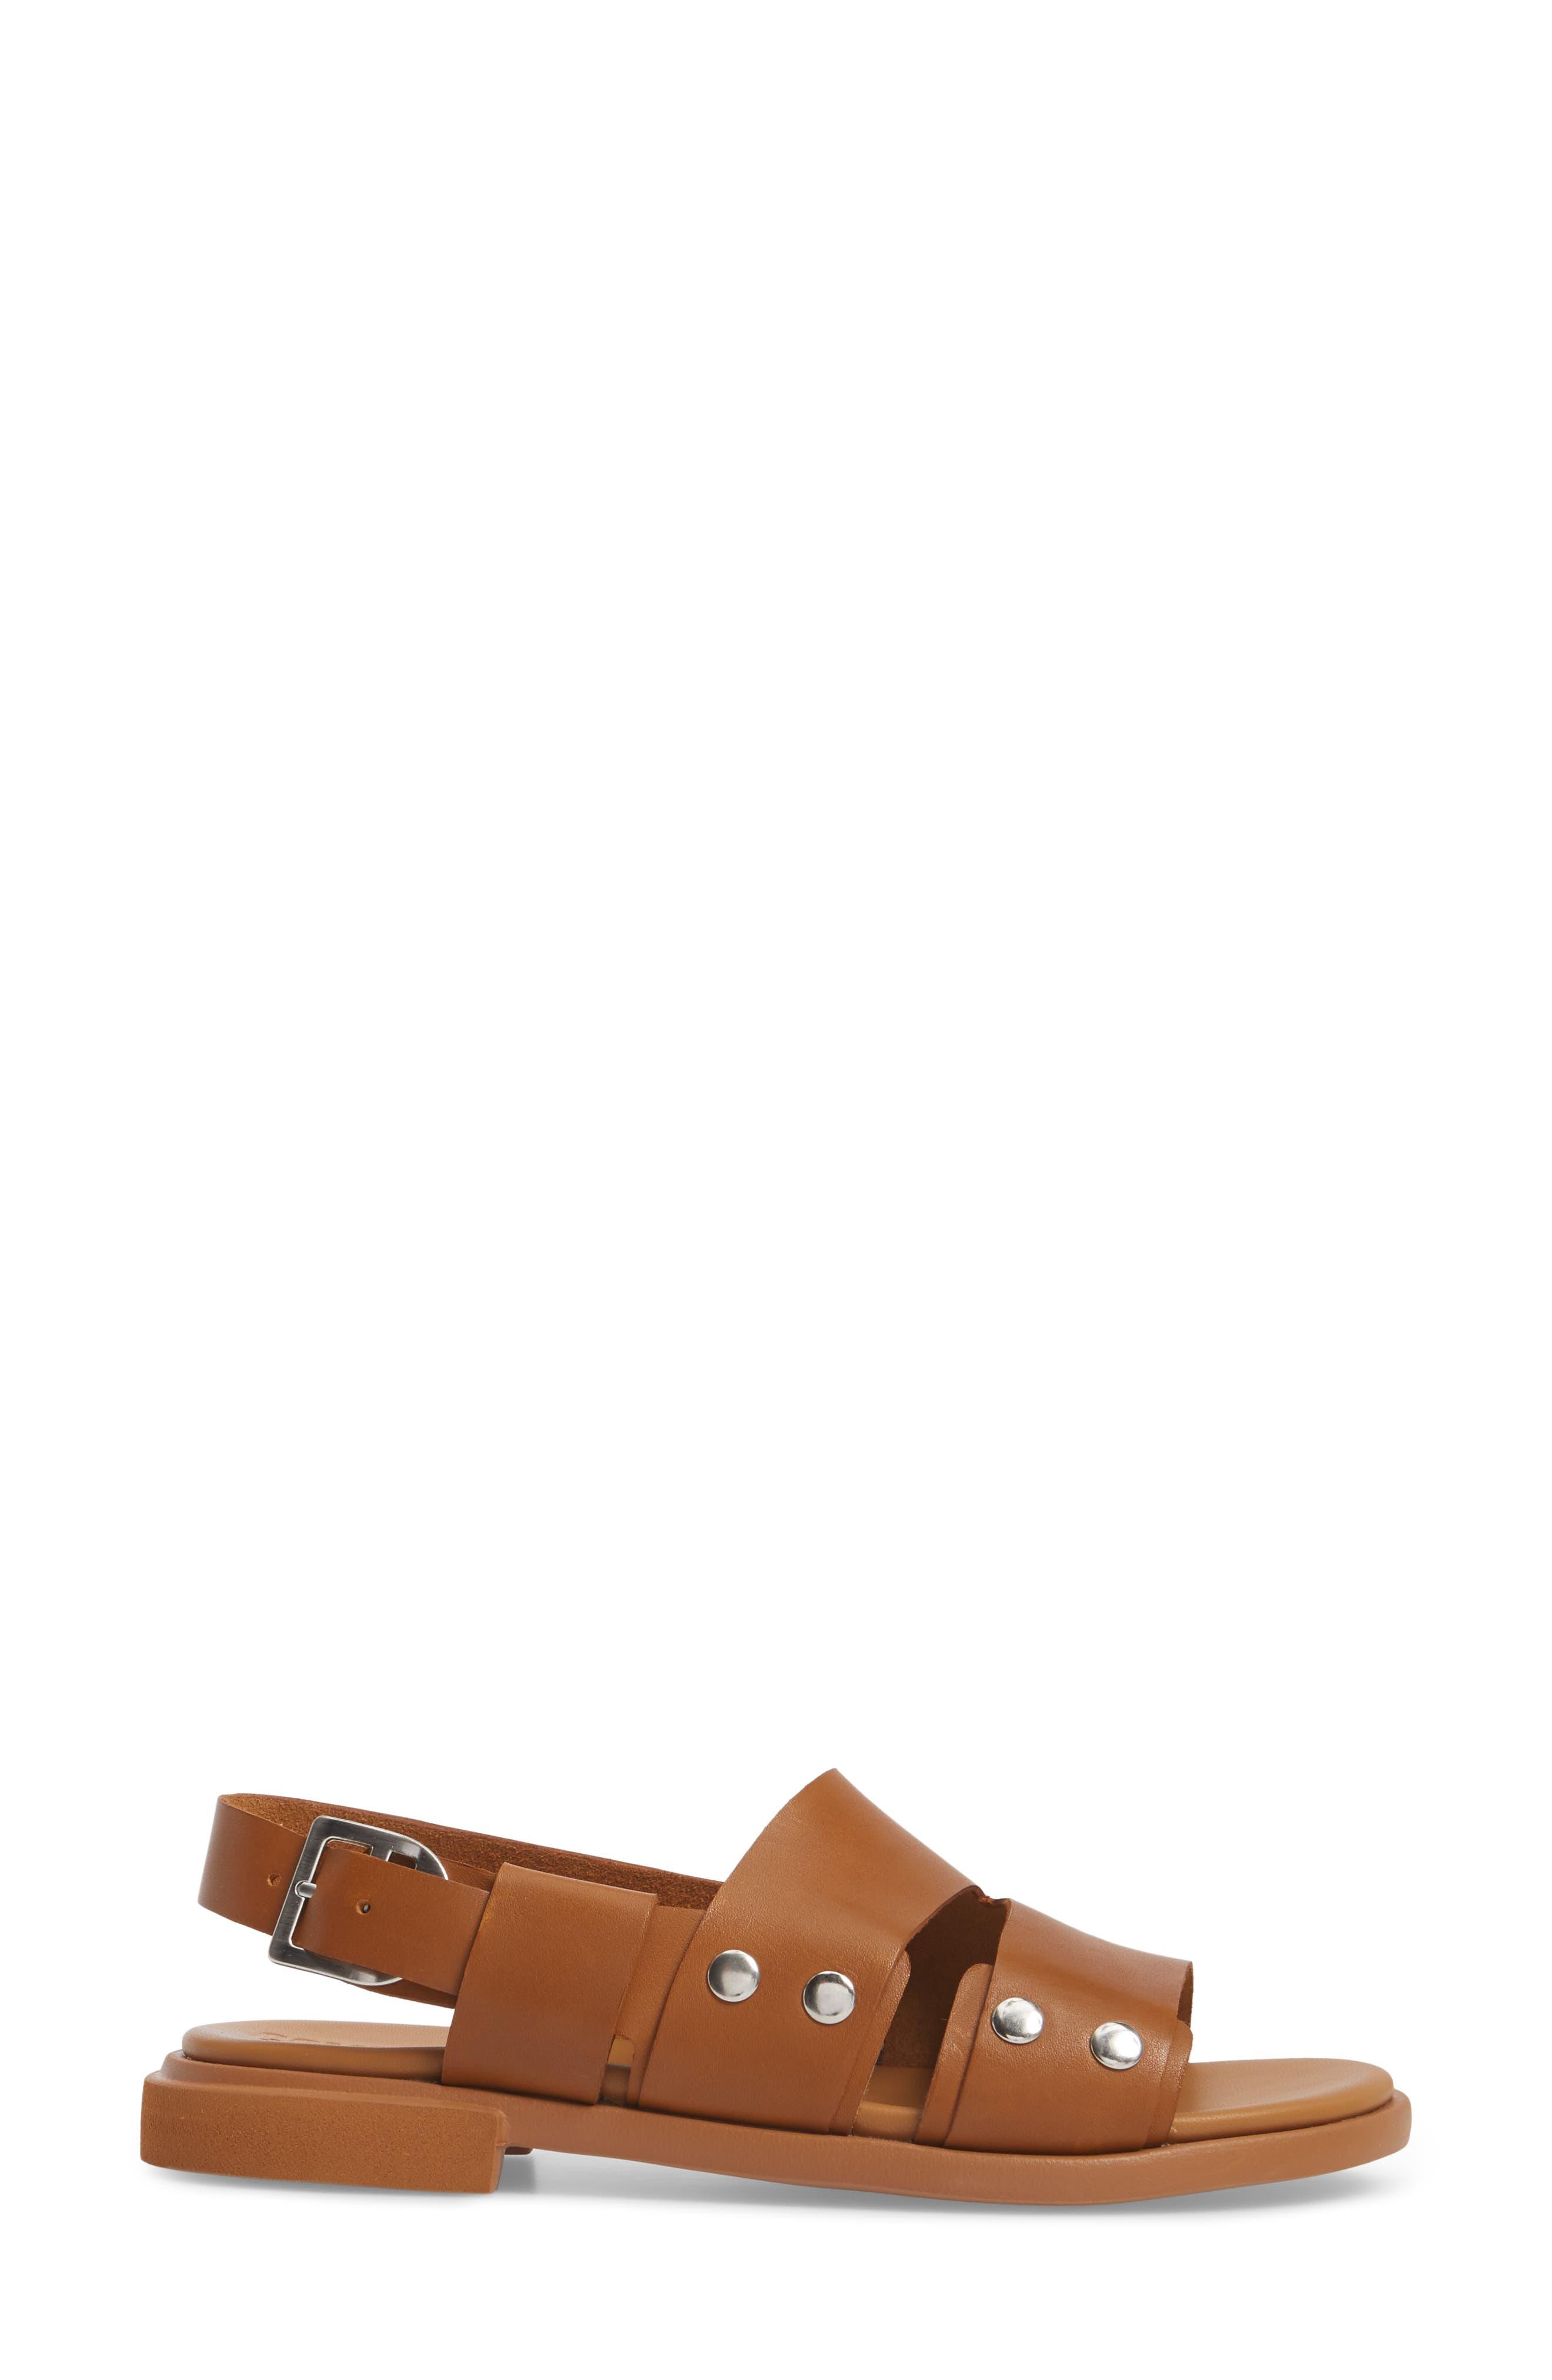 Edy Slingback Sandal,                             Alternate thumbnail 3, color,                             Rust/ Copper Leather